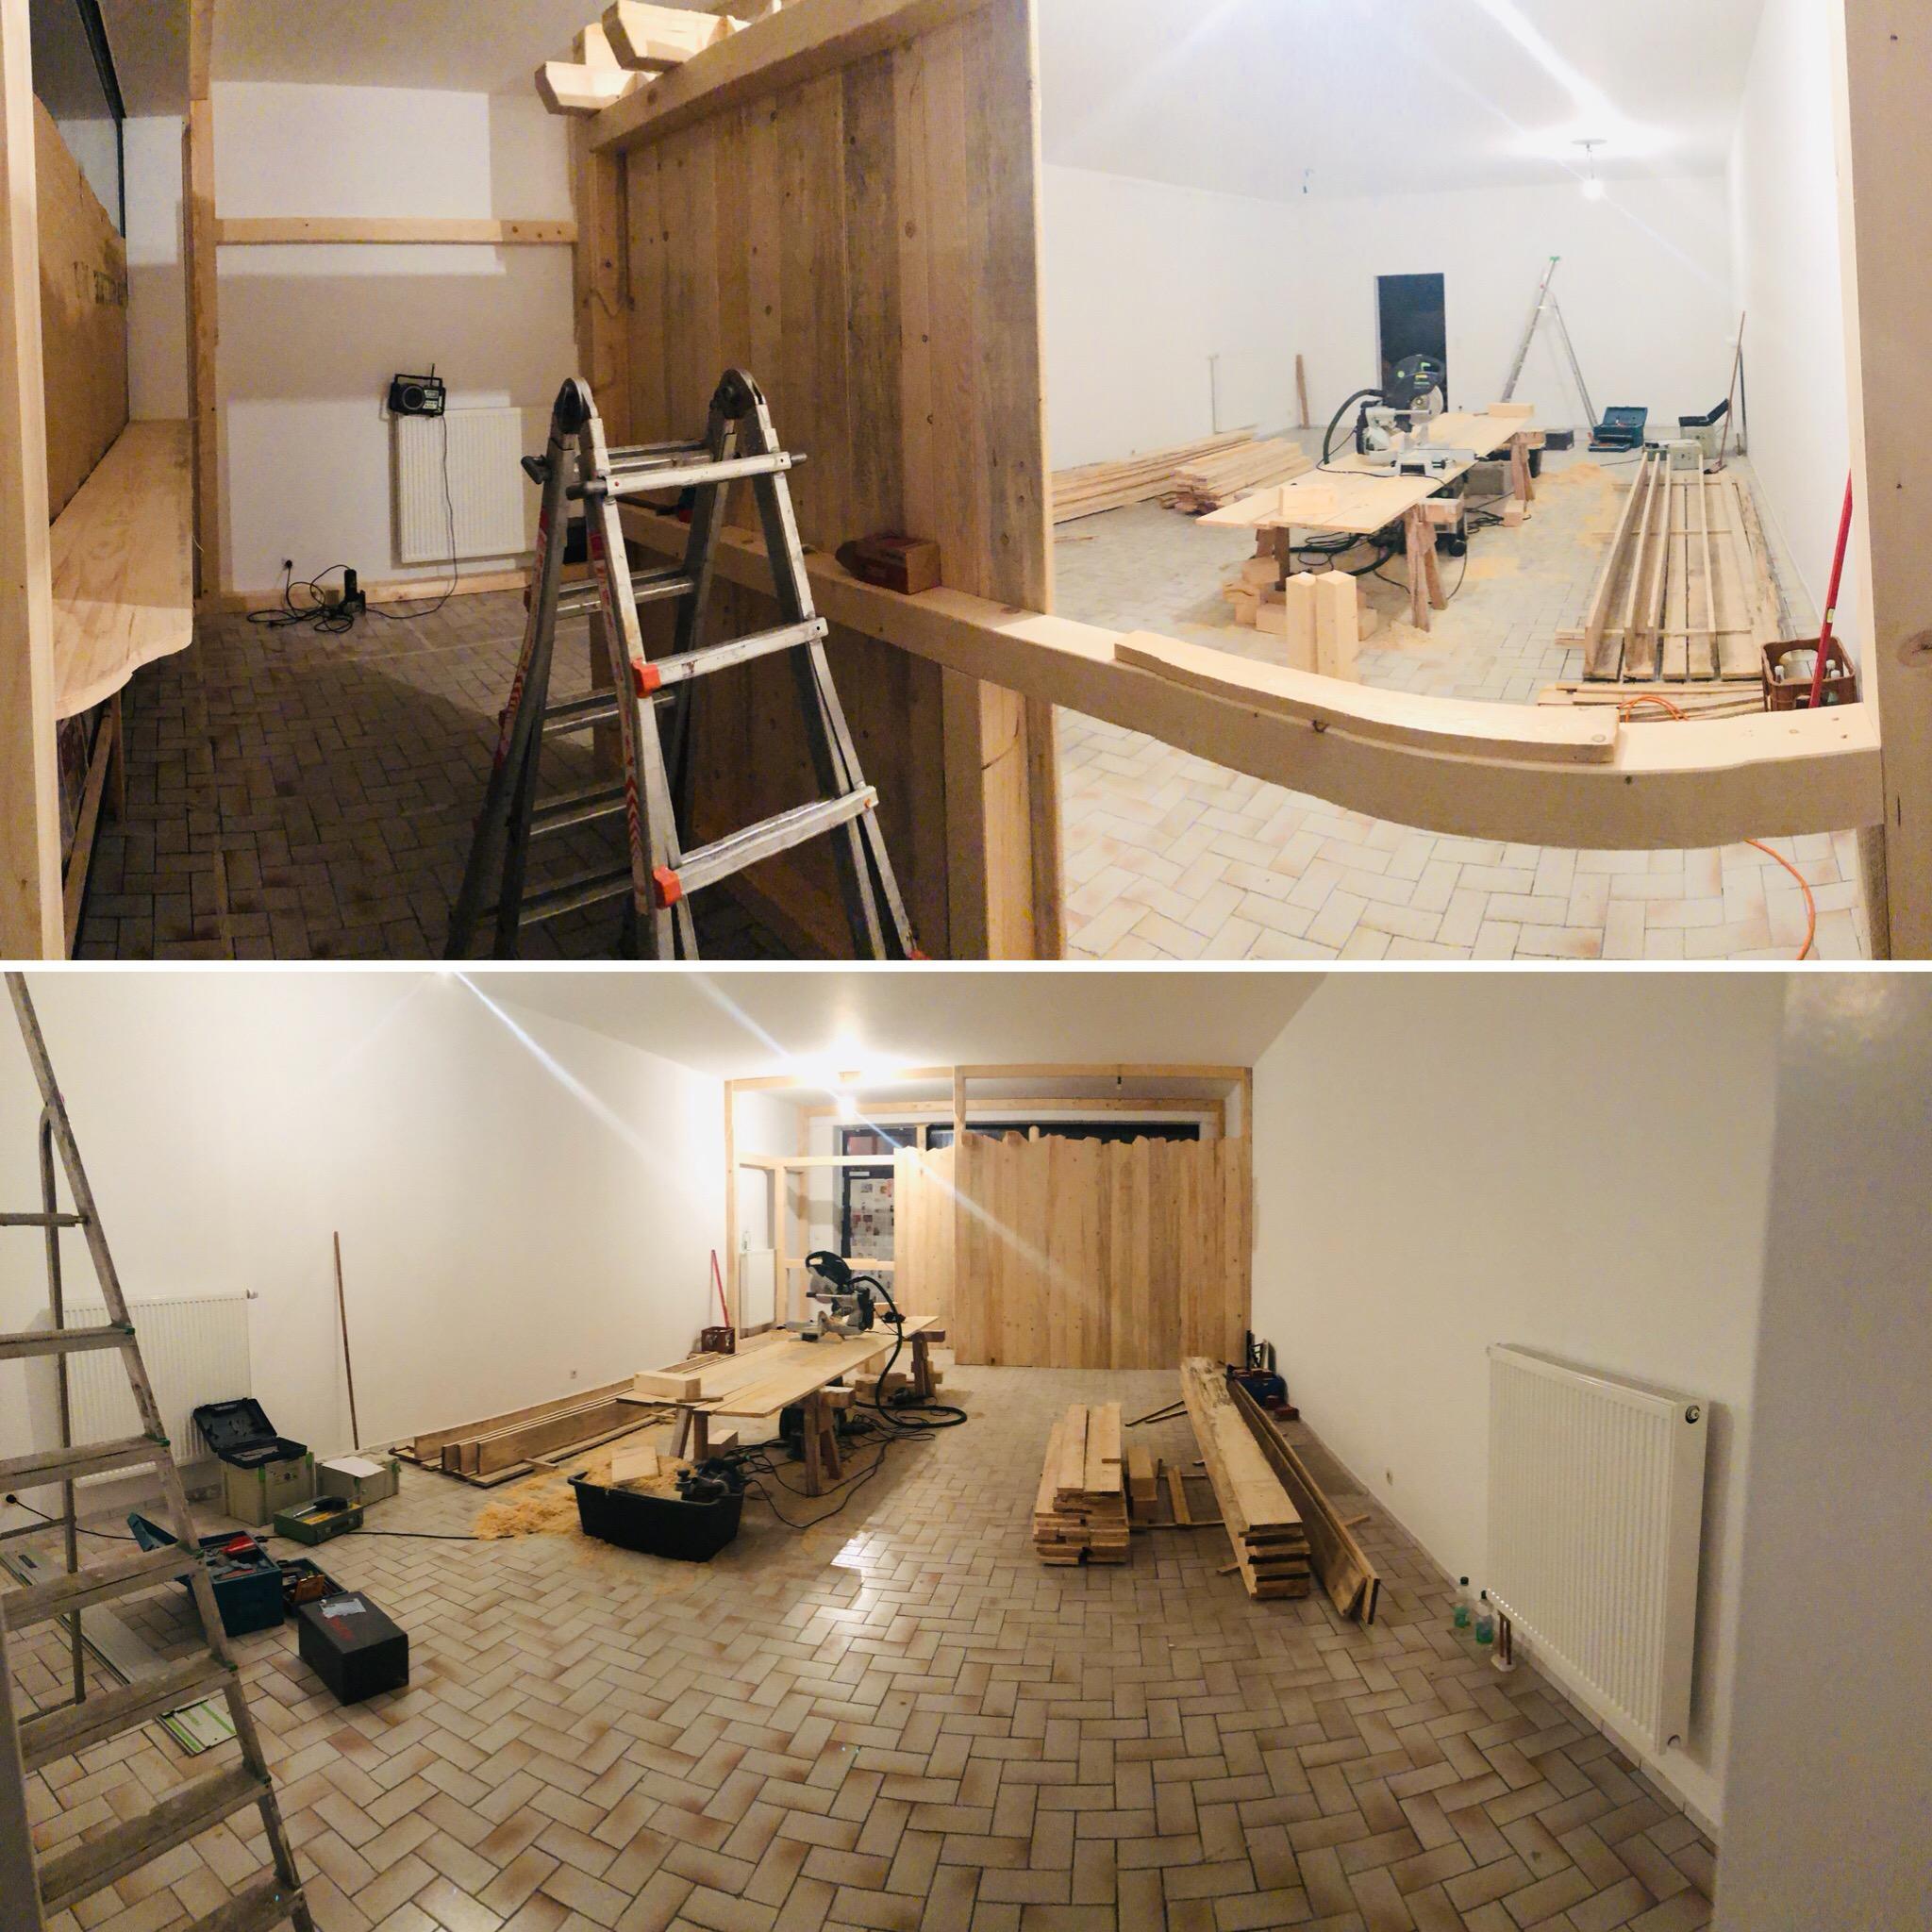 Bilder vom Umbau